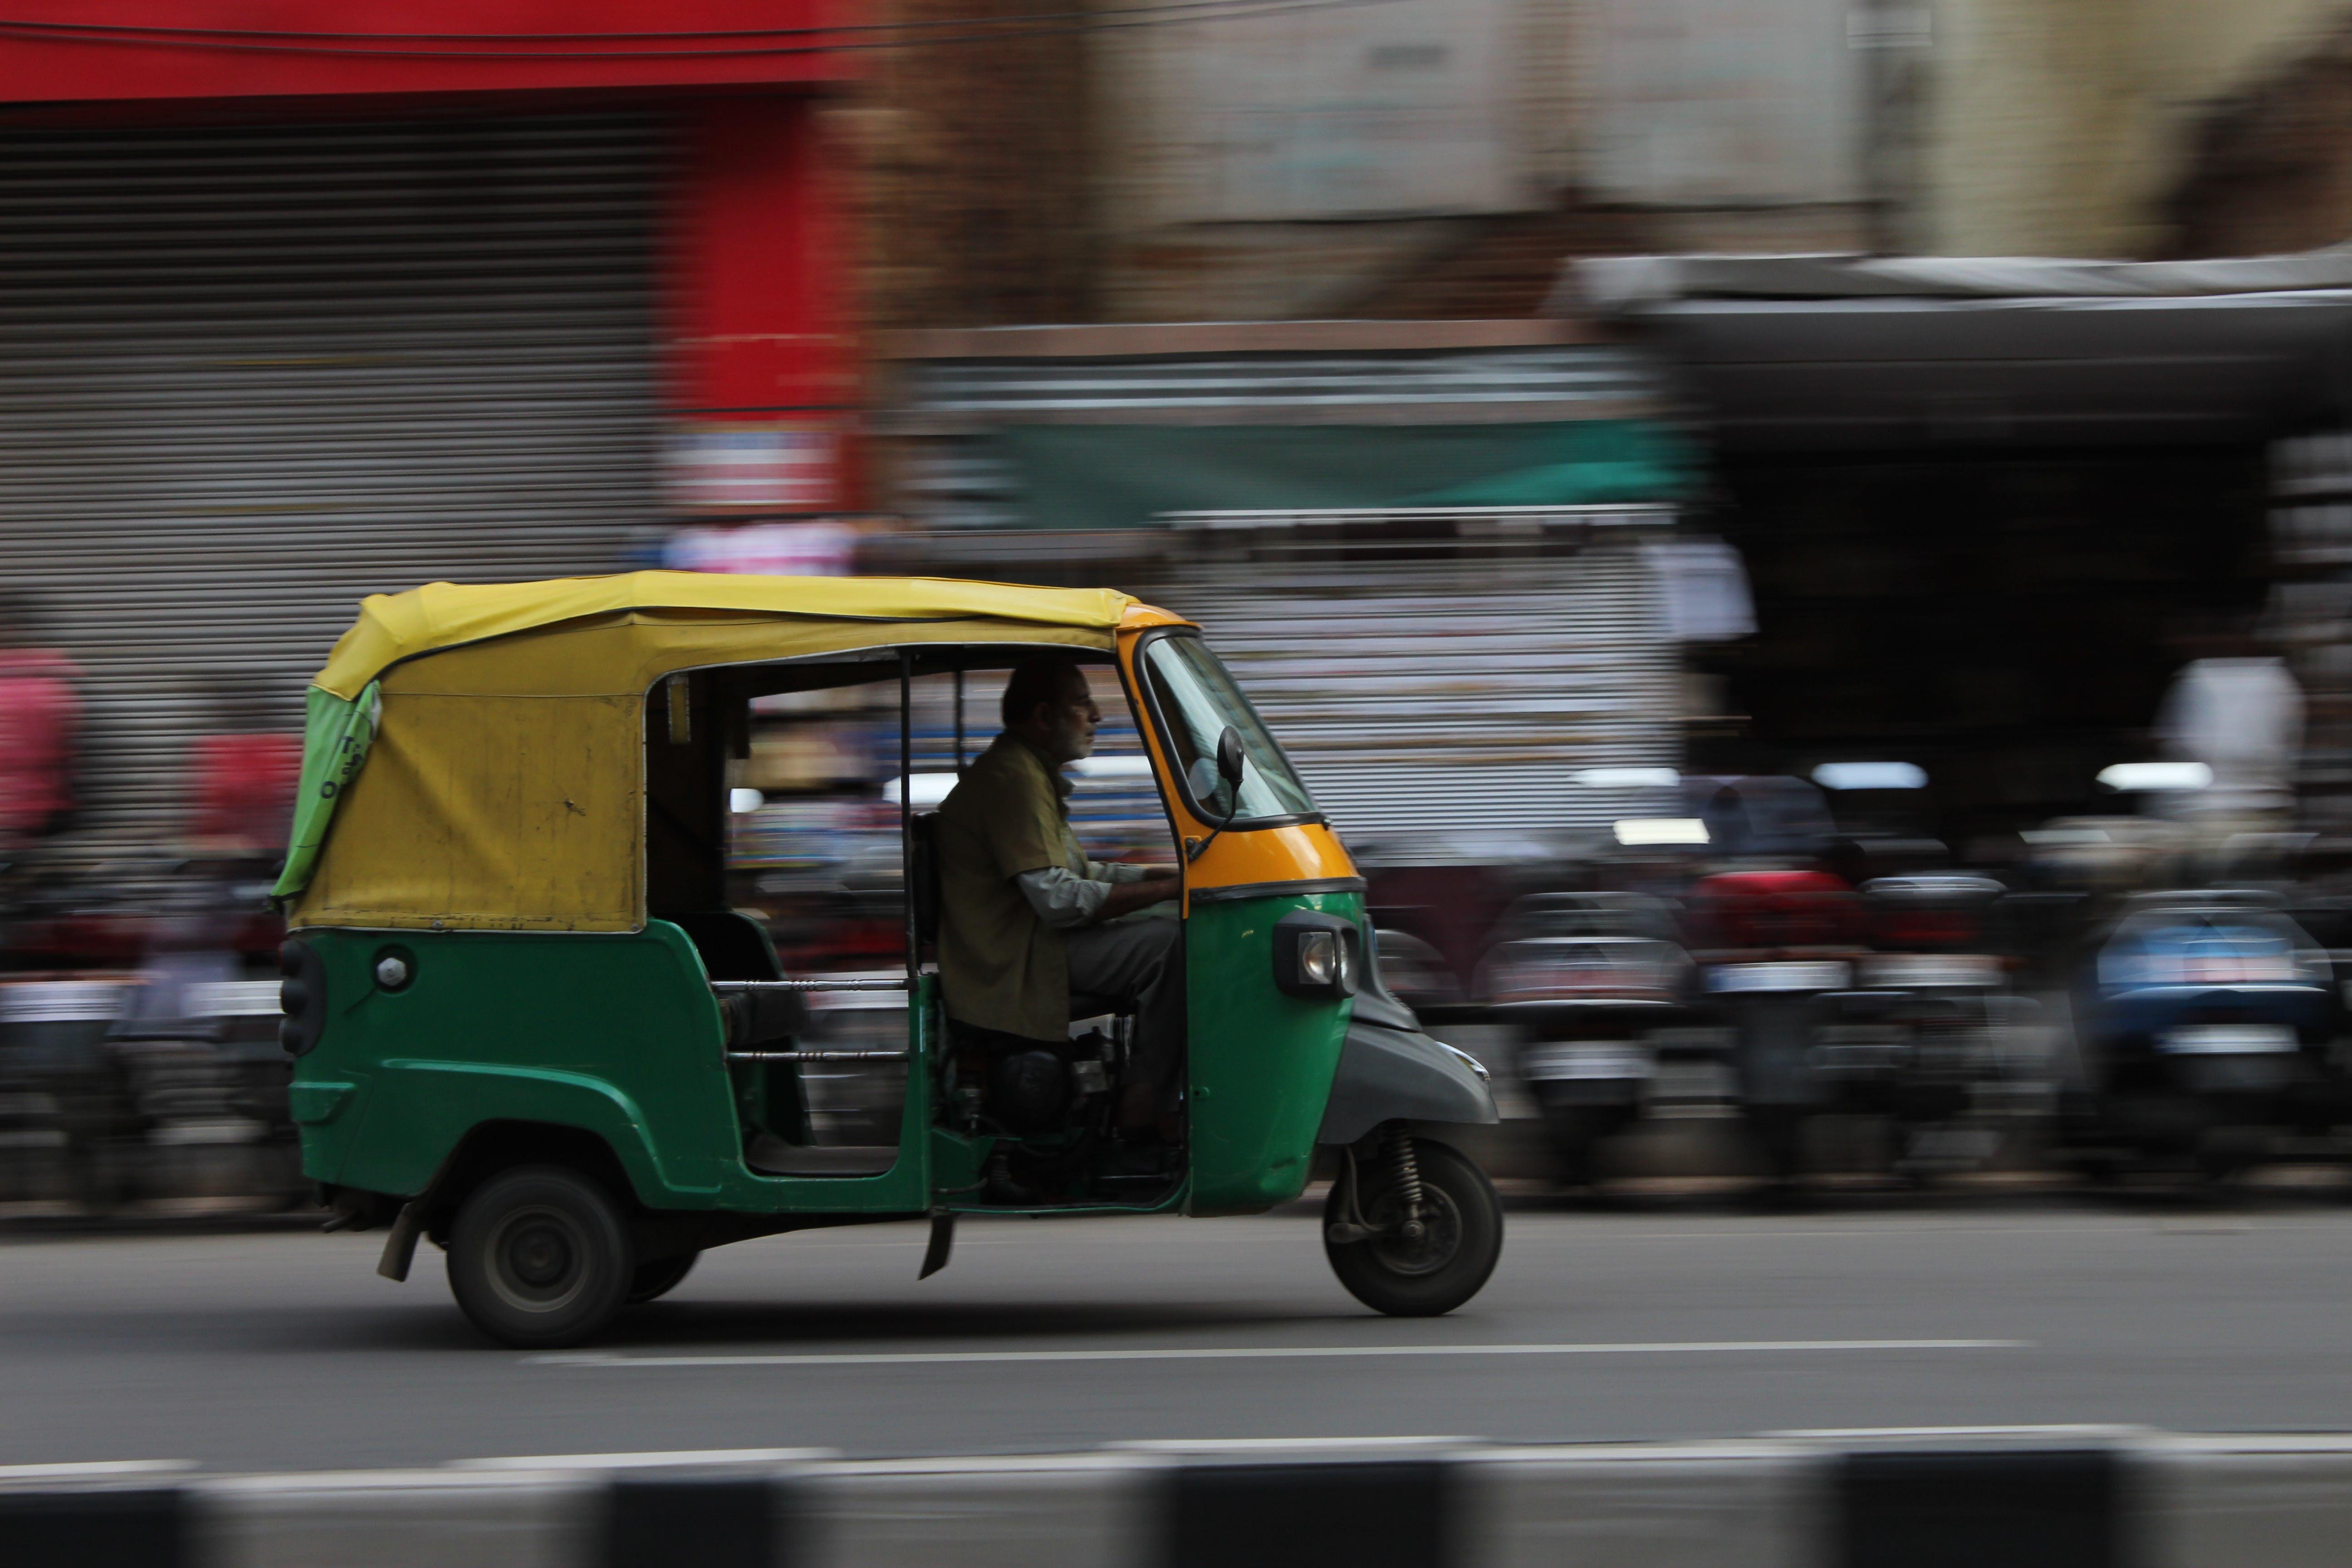 Free stock photo of traffic, india, auto, roads